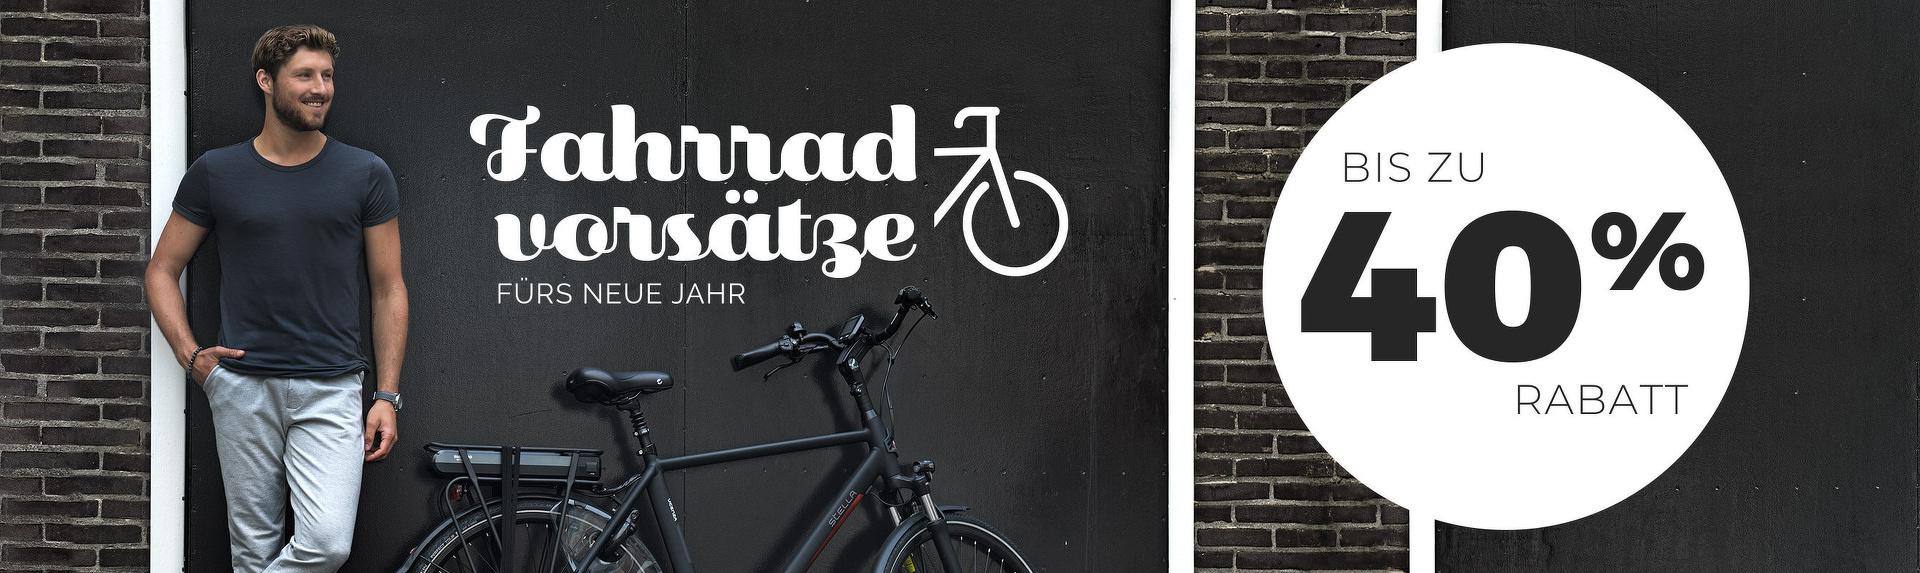 Fahrradvorsätze fürs neue Jahr